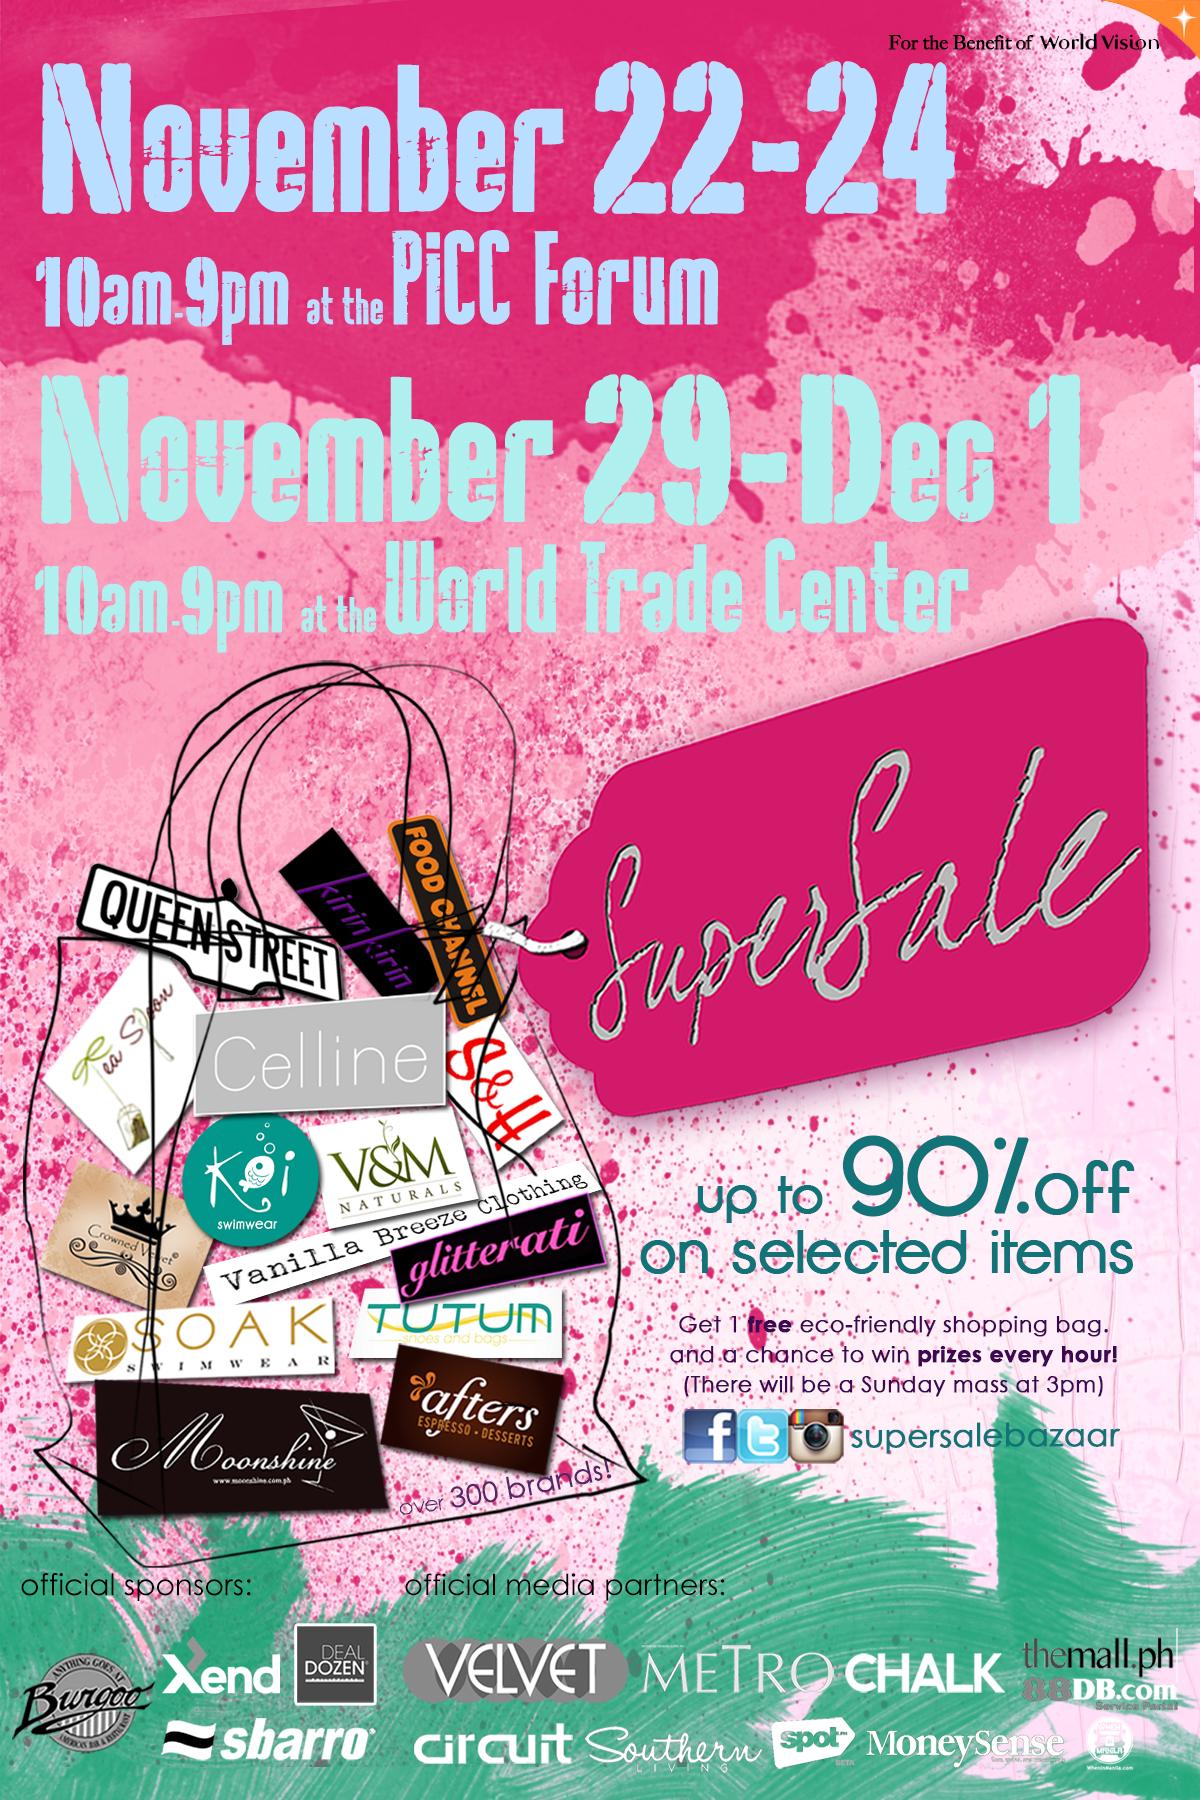 SuperSale Holiday Bazaar @ PICC Forum November 2013